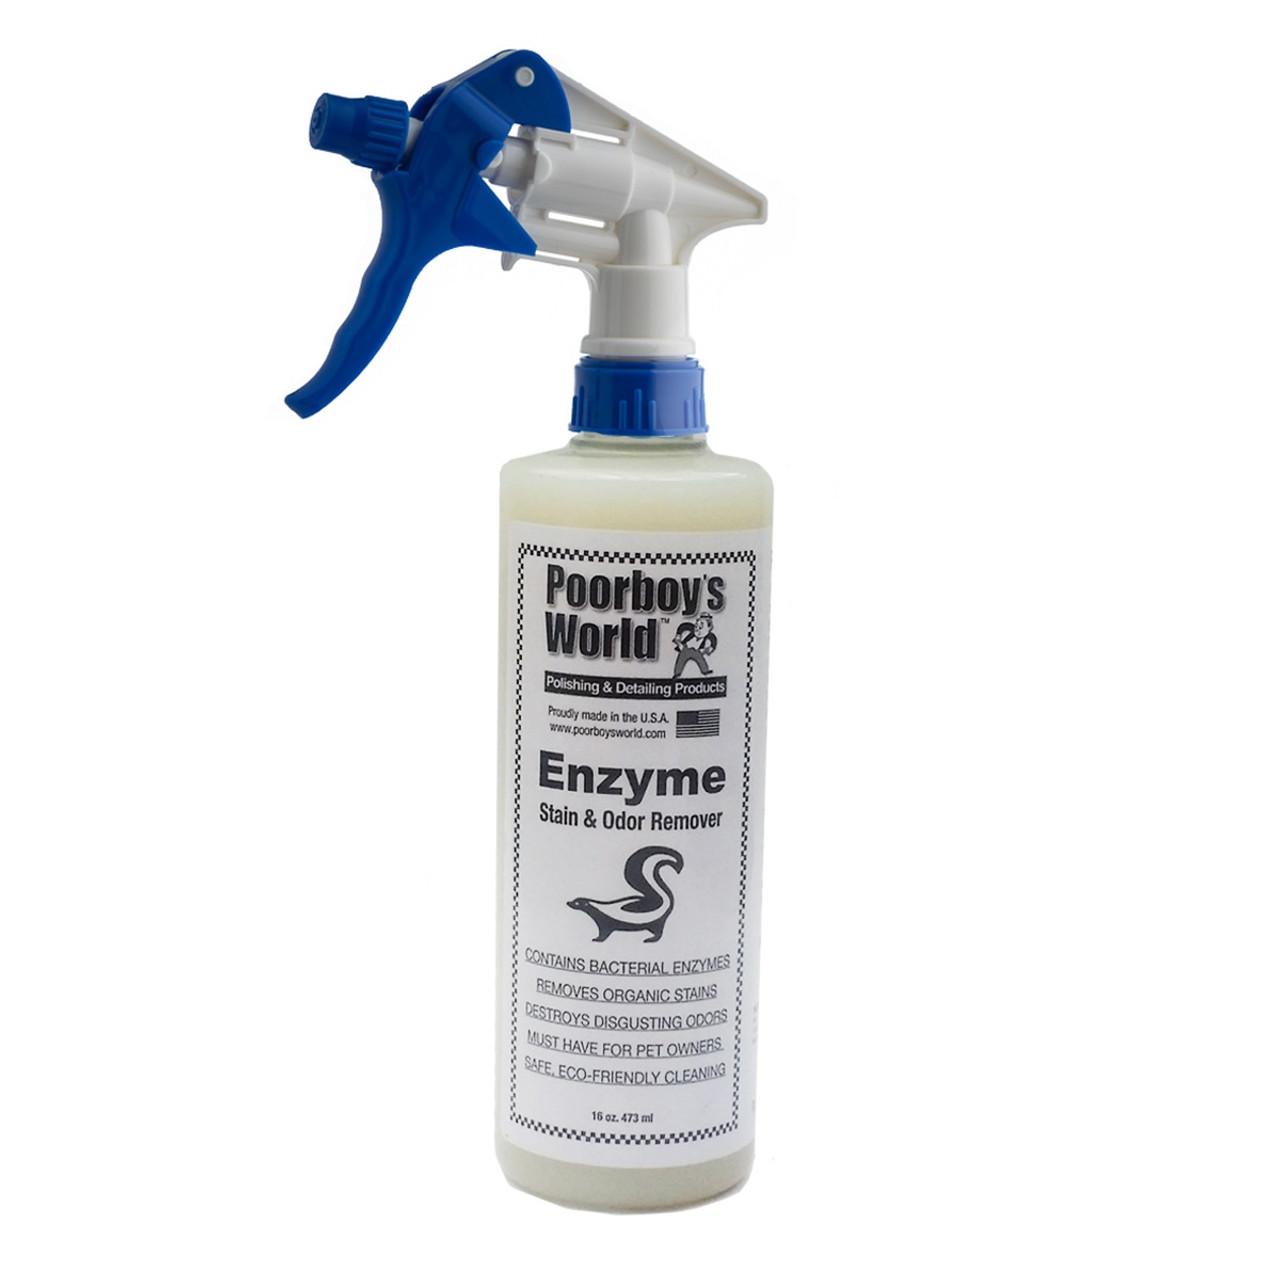 Poorboy's World Enzyme Stain & Odor Remover 16oz w/Sprayer